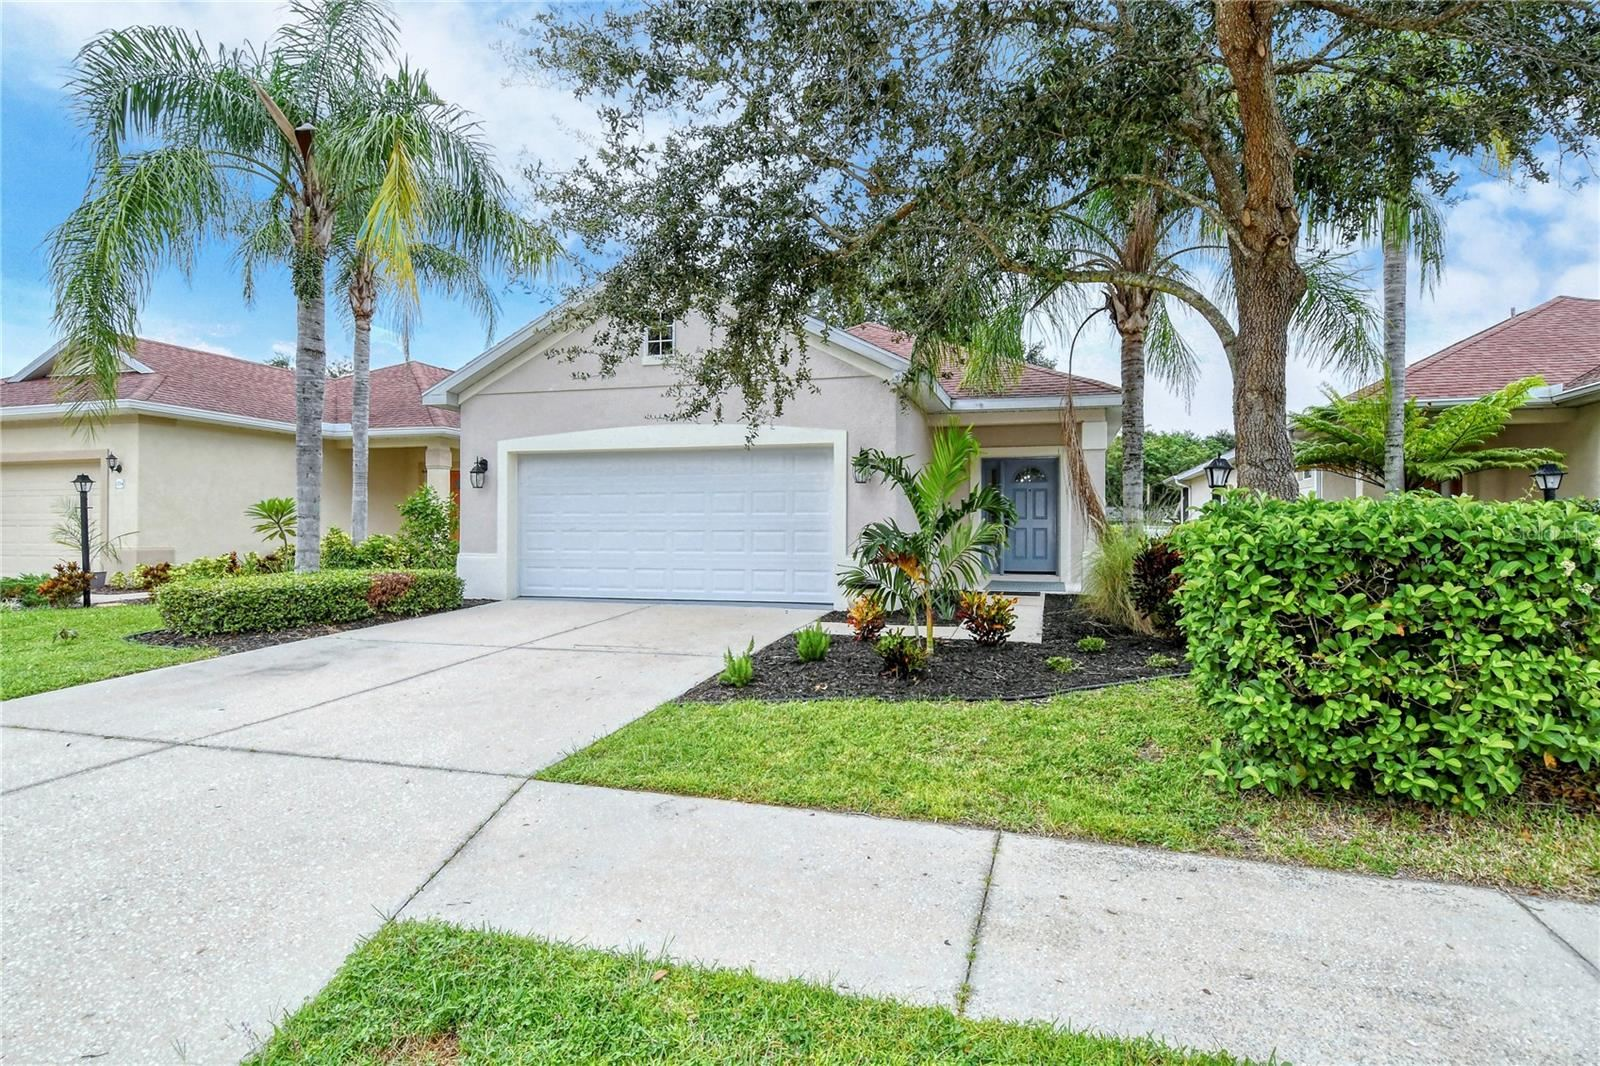 1348 DARYL DRIVE, Sarasota, FL 34232 - #: A4512196